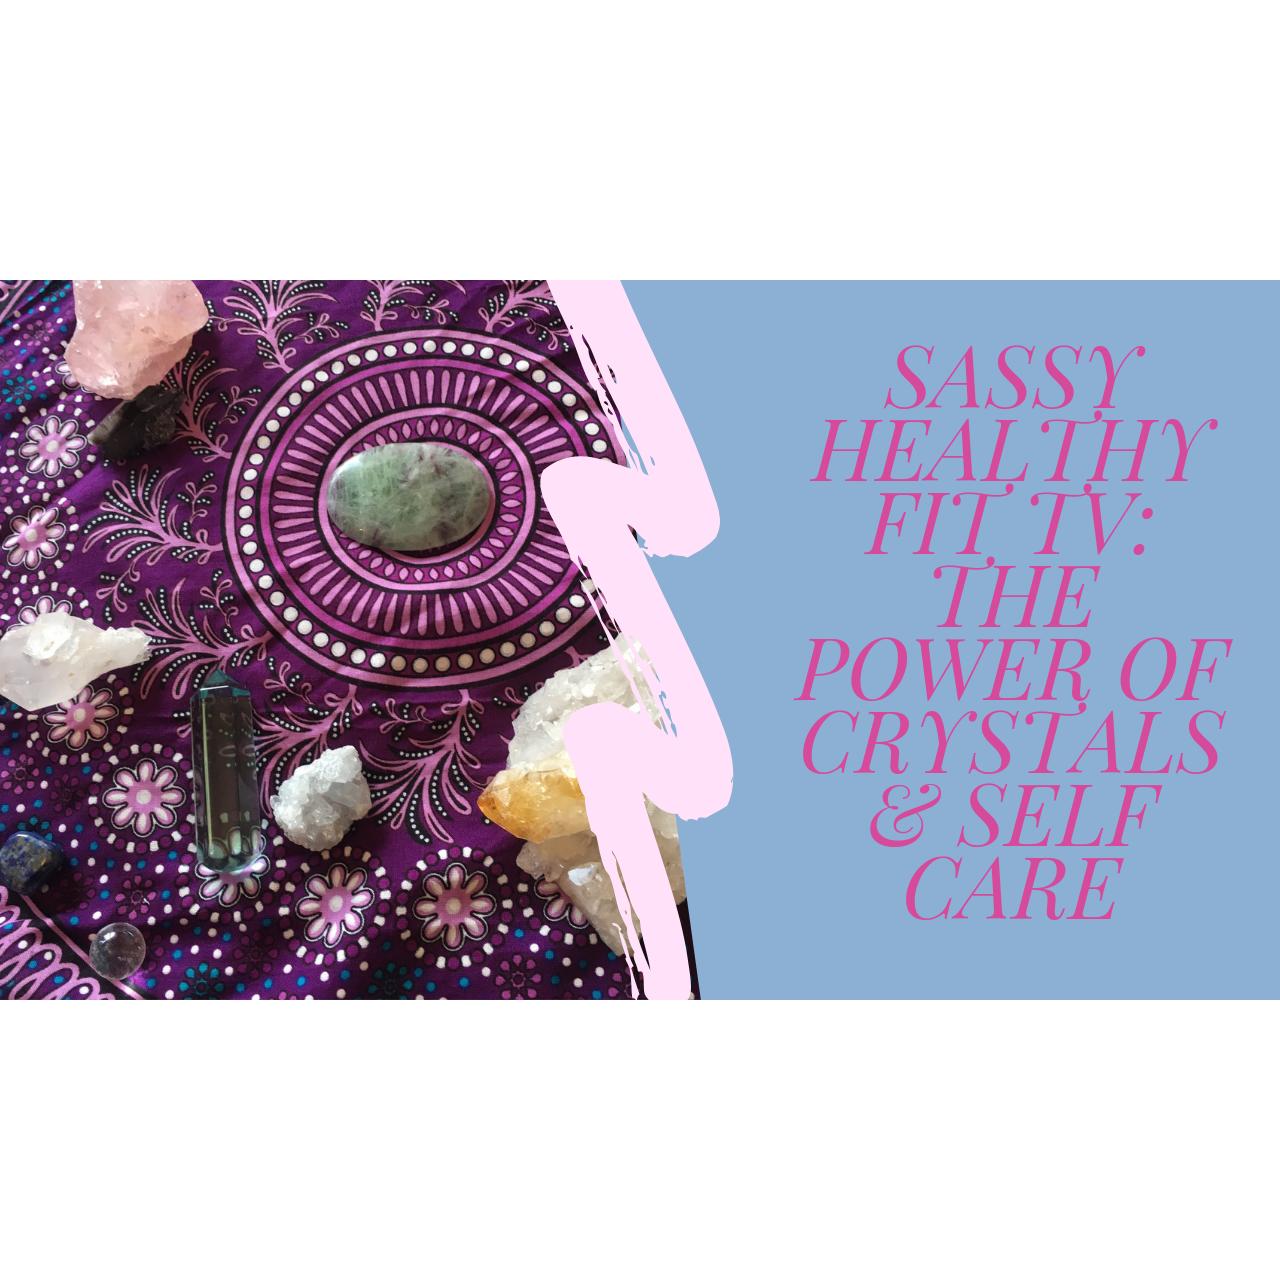 crystals self care self love healing